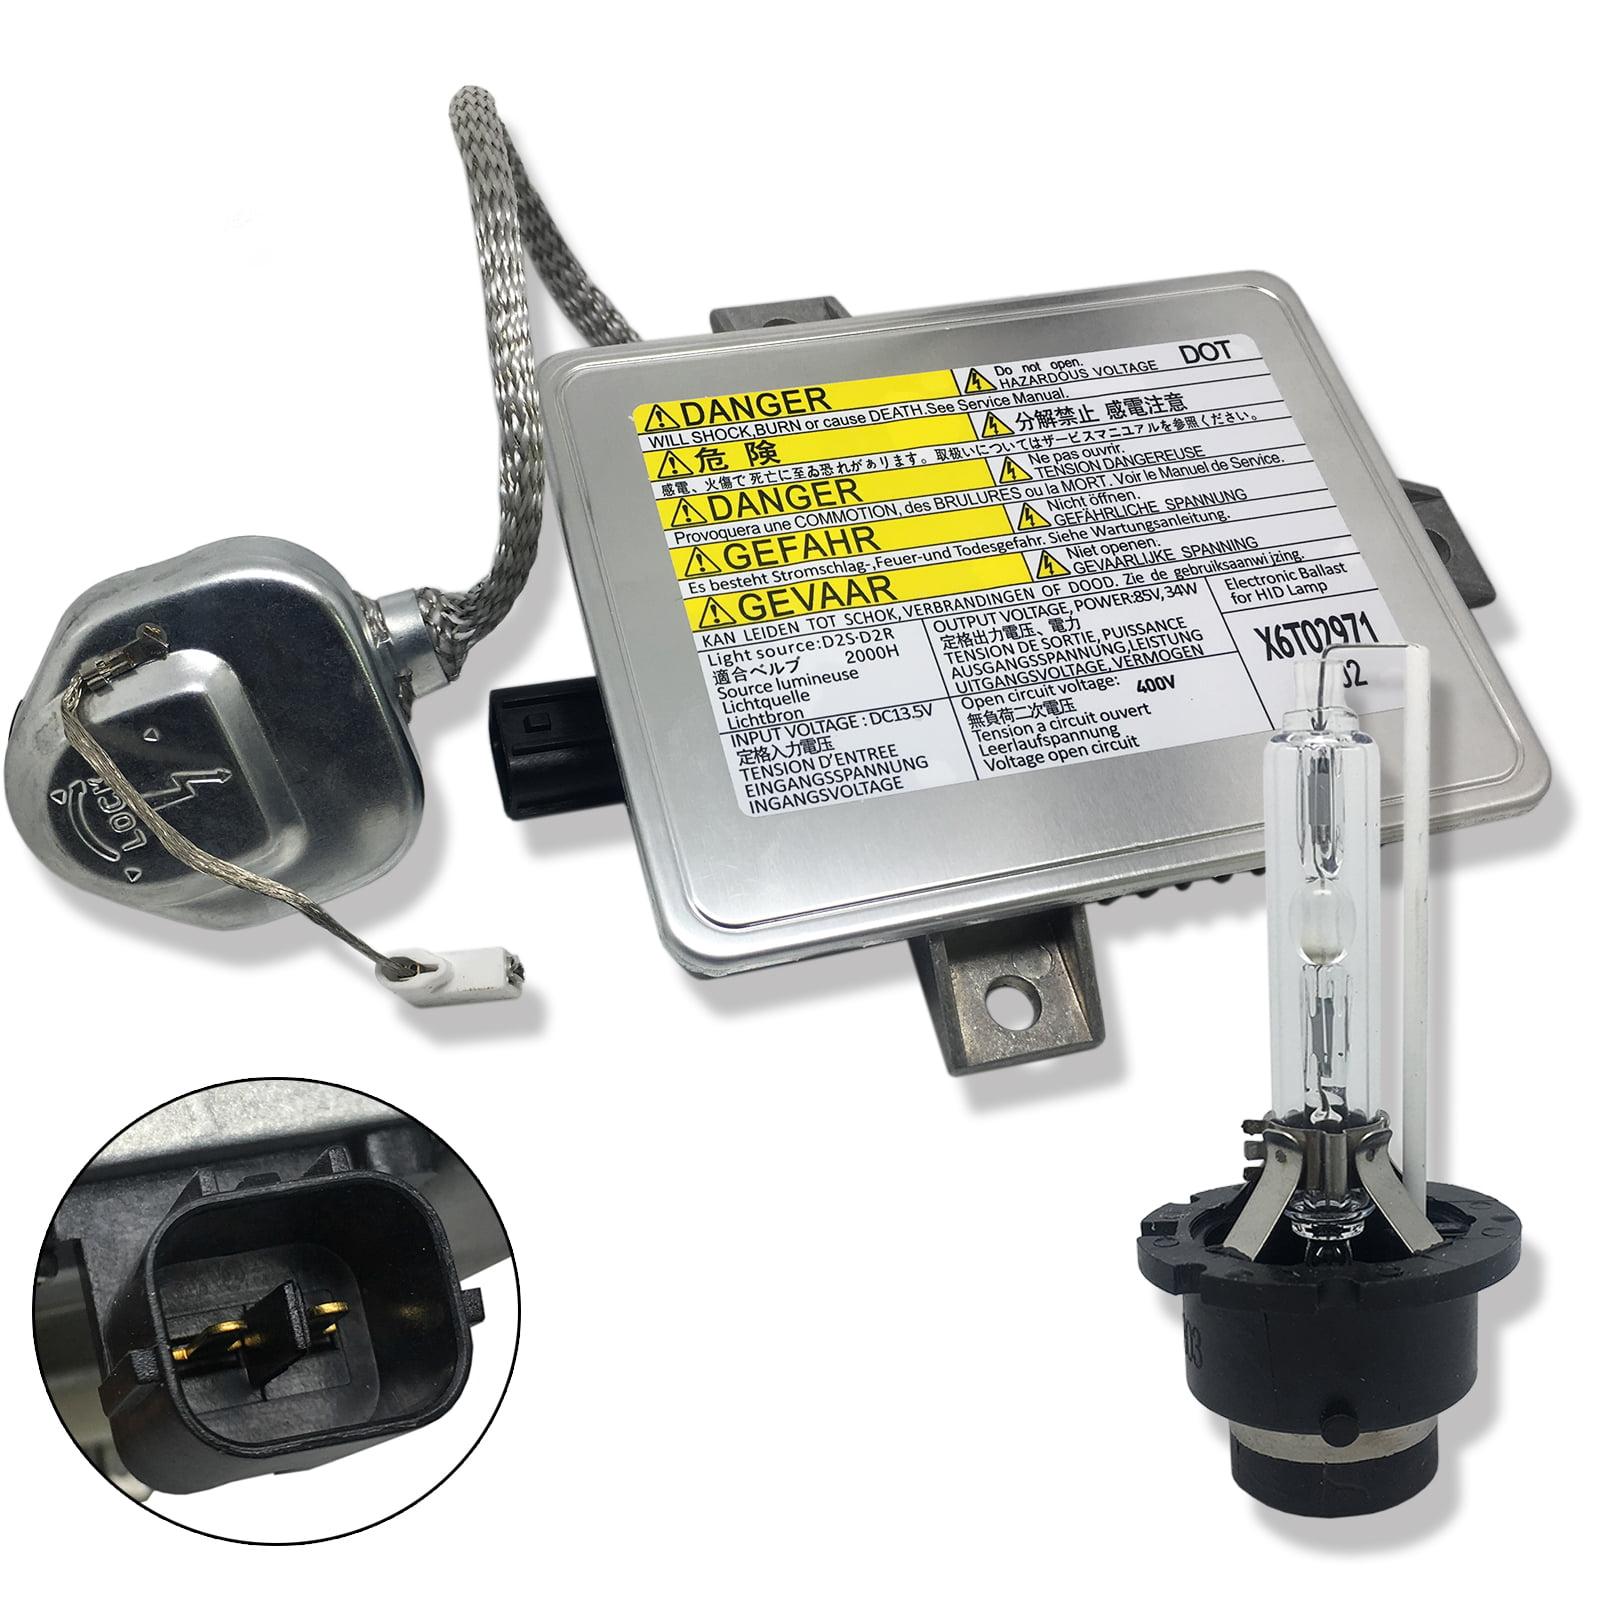 New HID Xenon Headlight Ballast & Igniter & Bulb For 2004